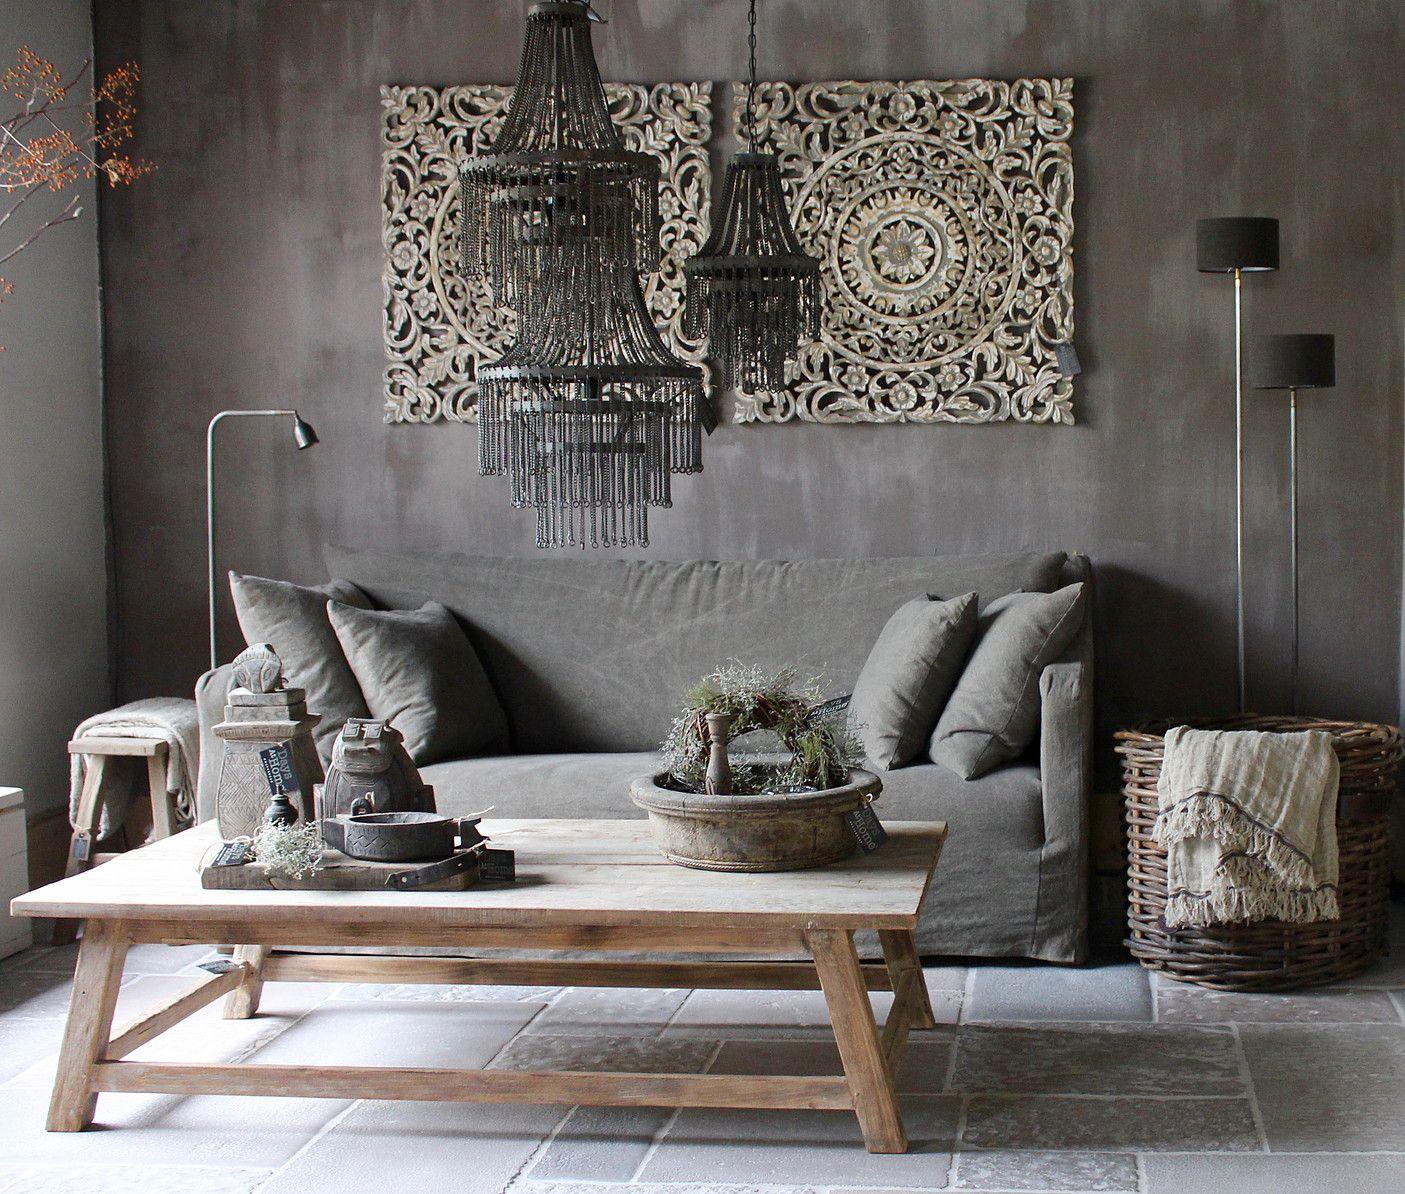 Stunning Wanddecoratie Woonkamer Landelijk Images - Home Ideas ...